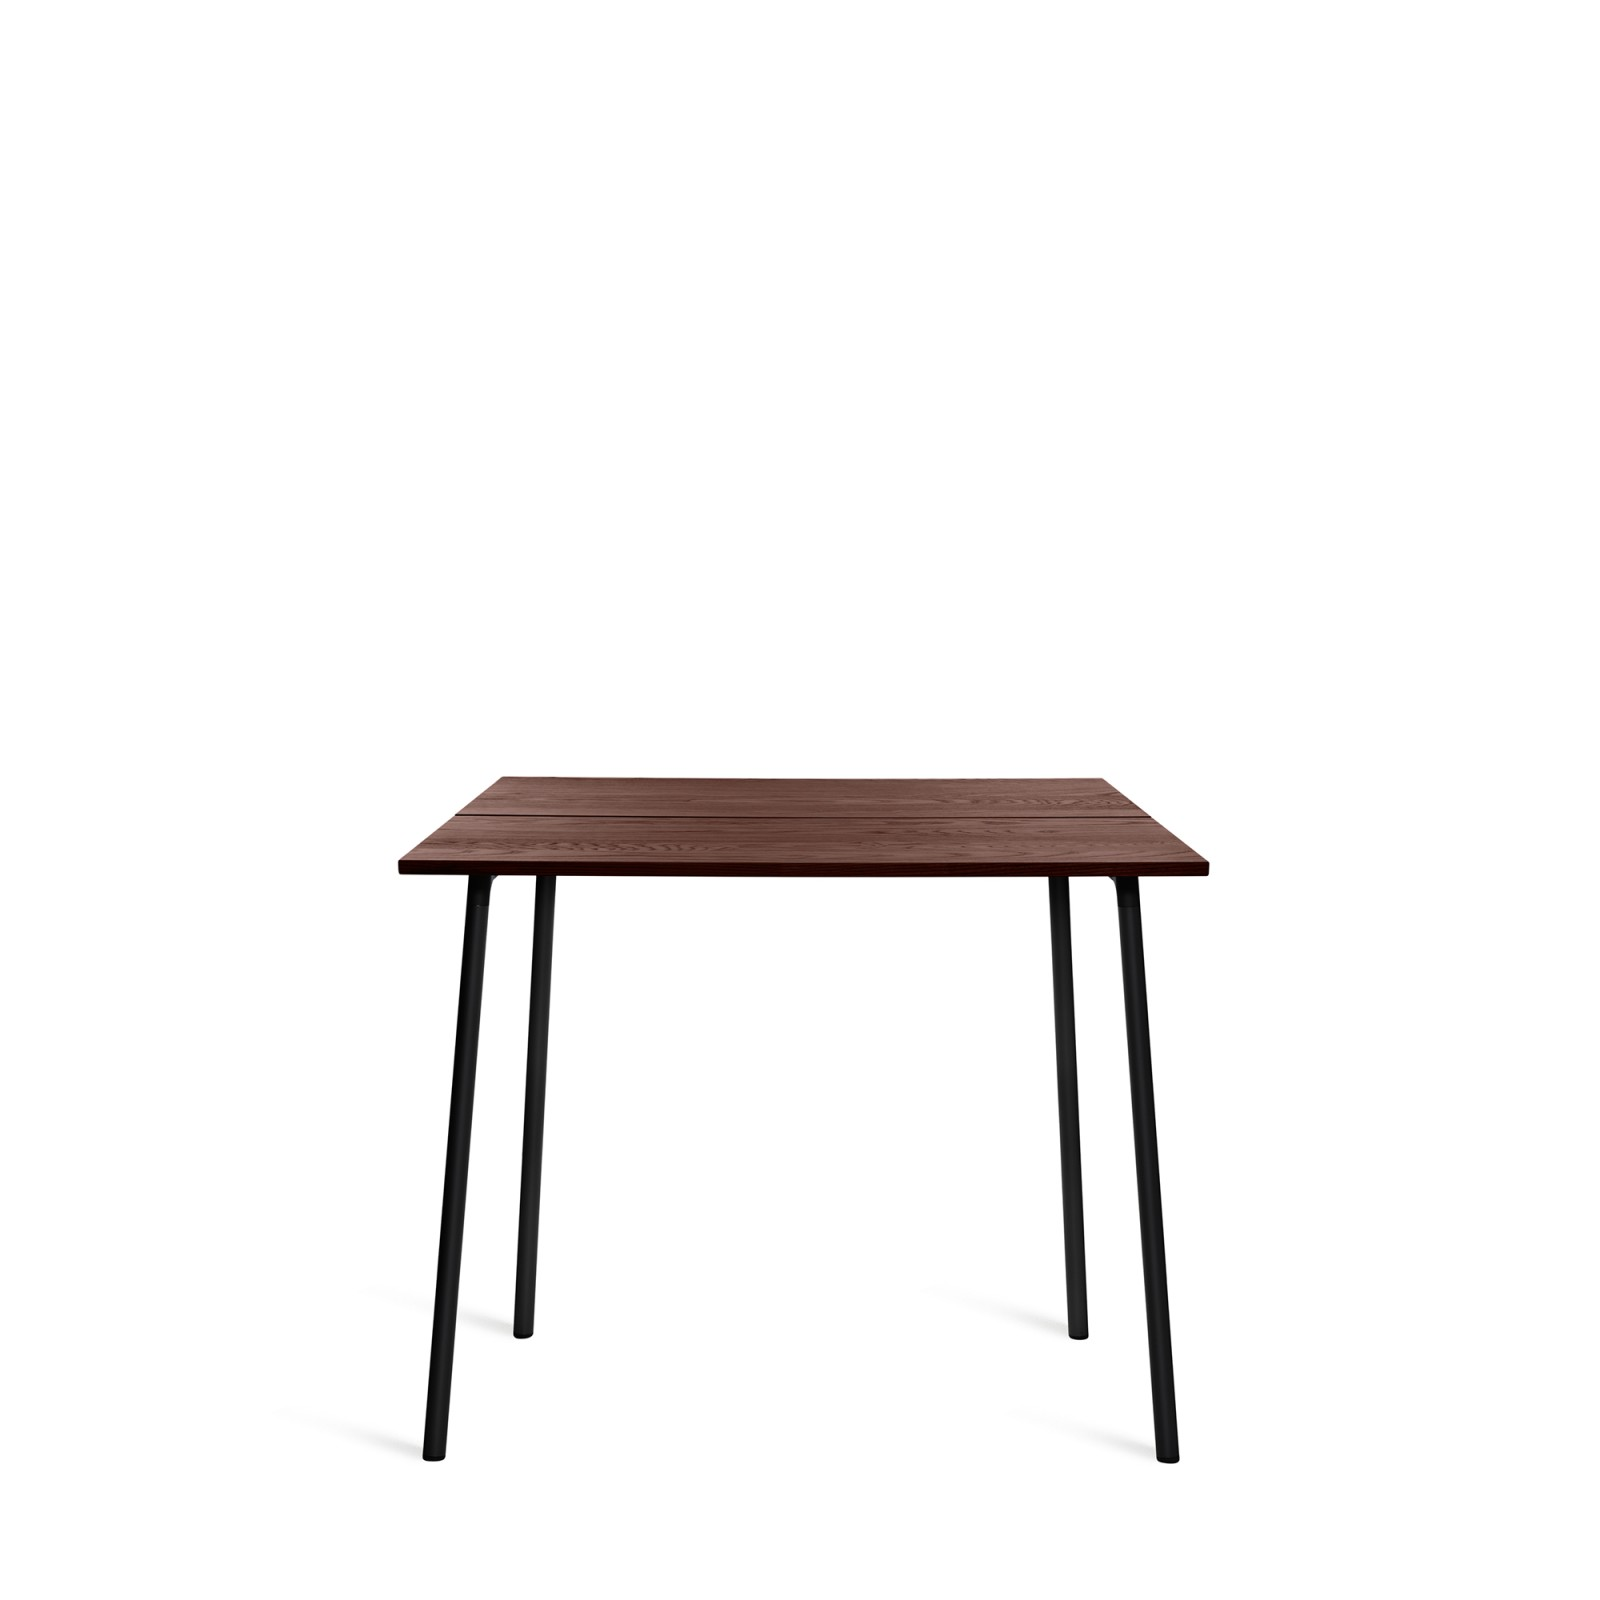 Run High Table Black, Walnut, 183cm